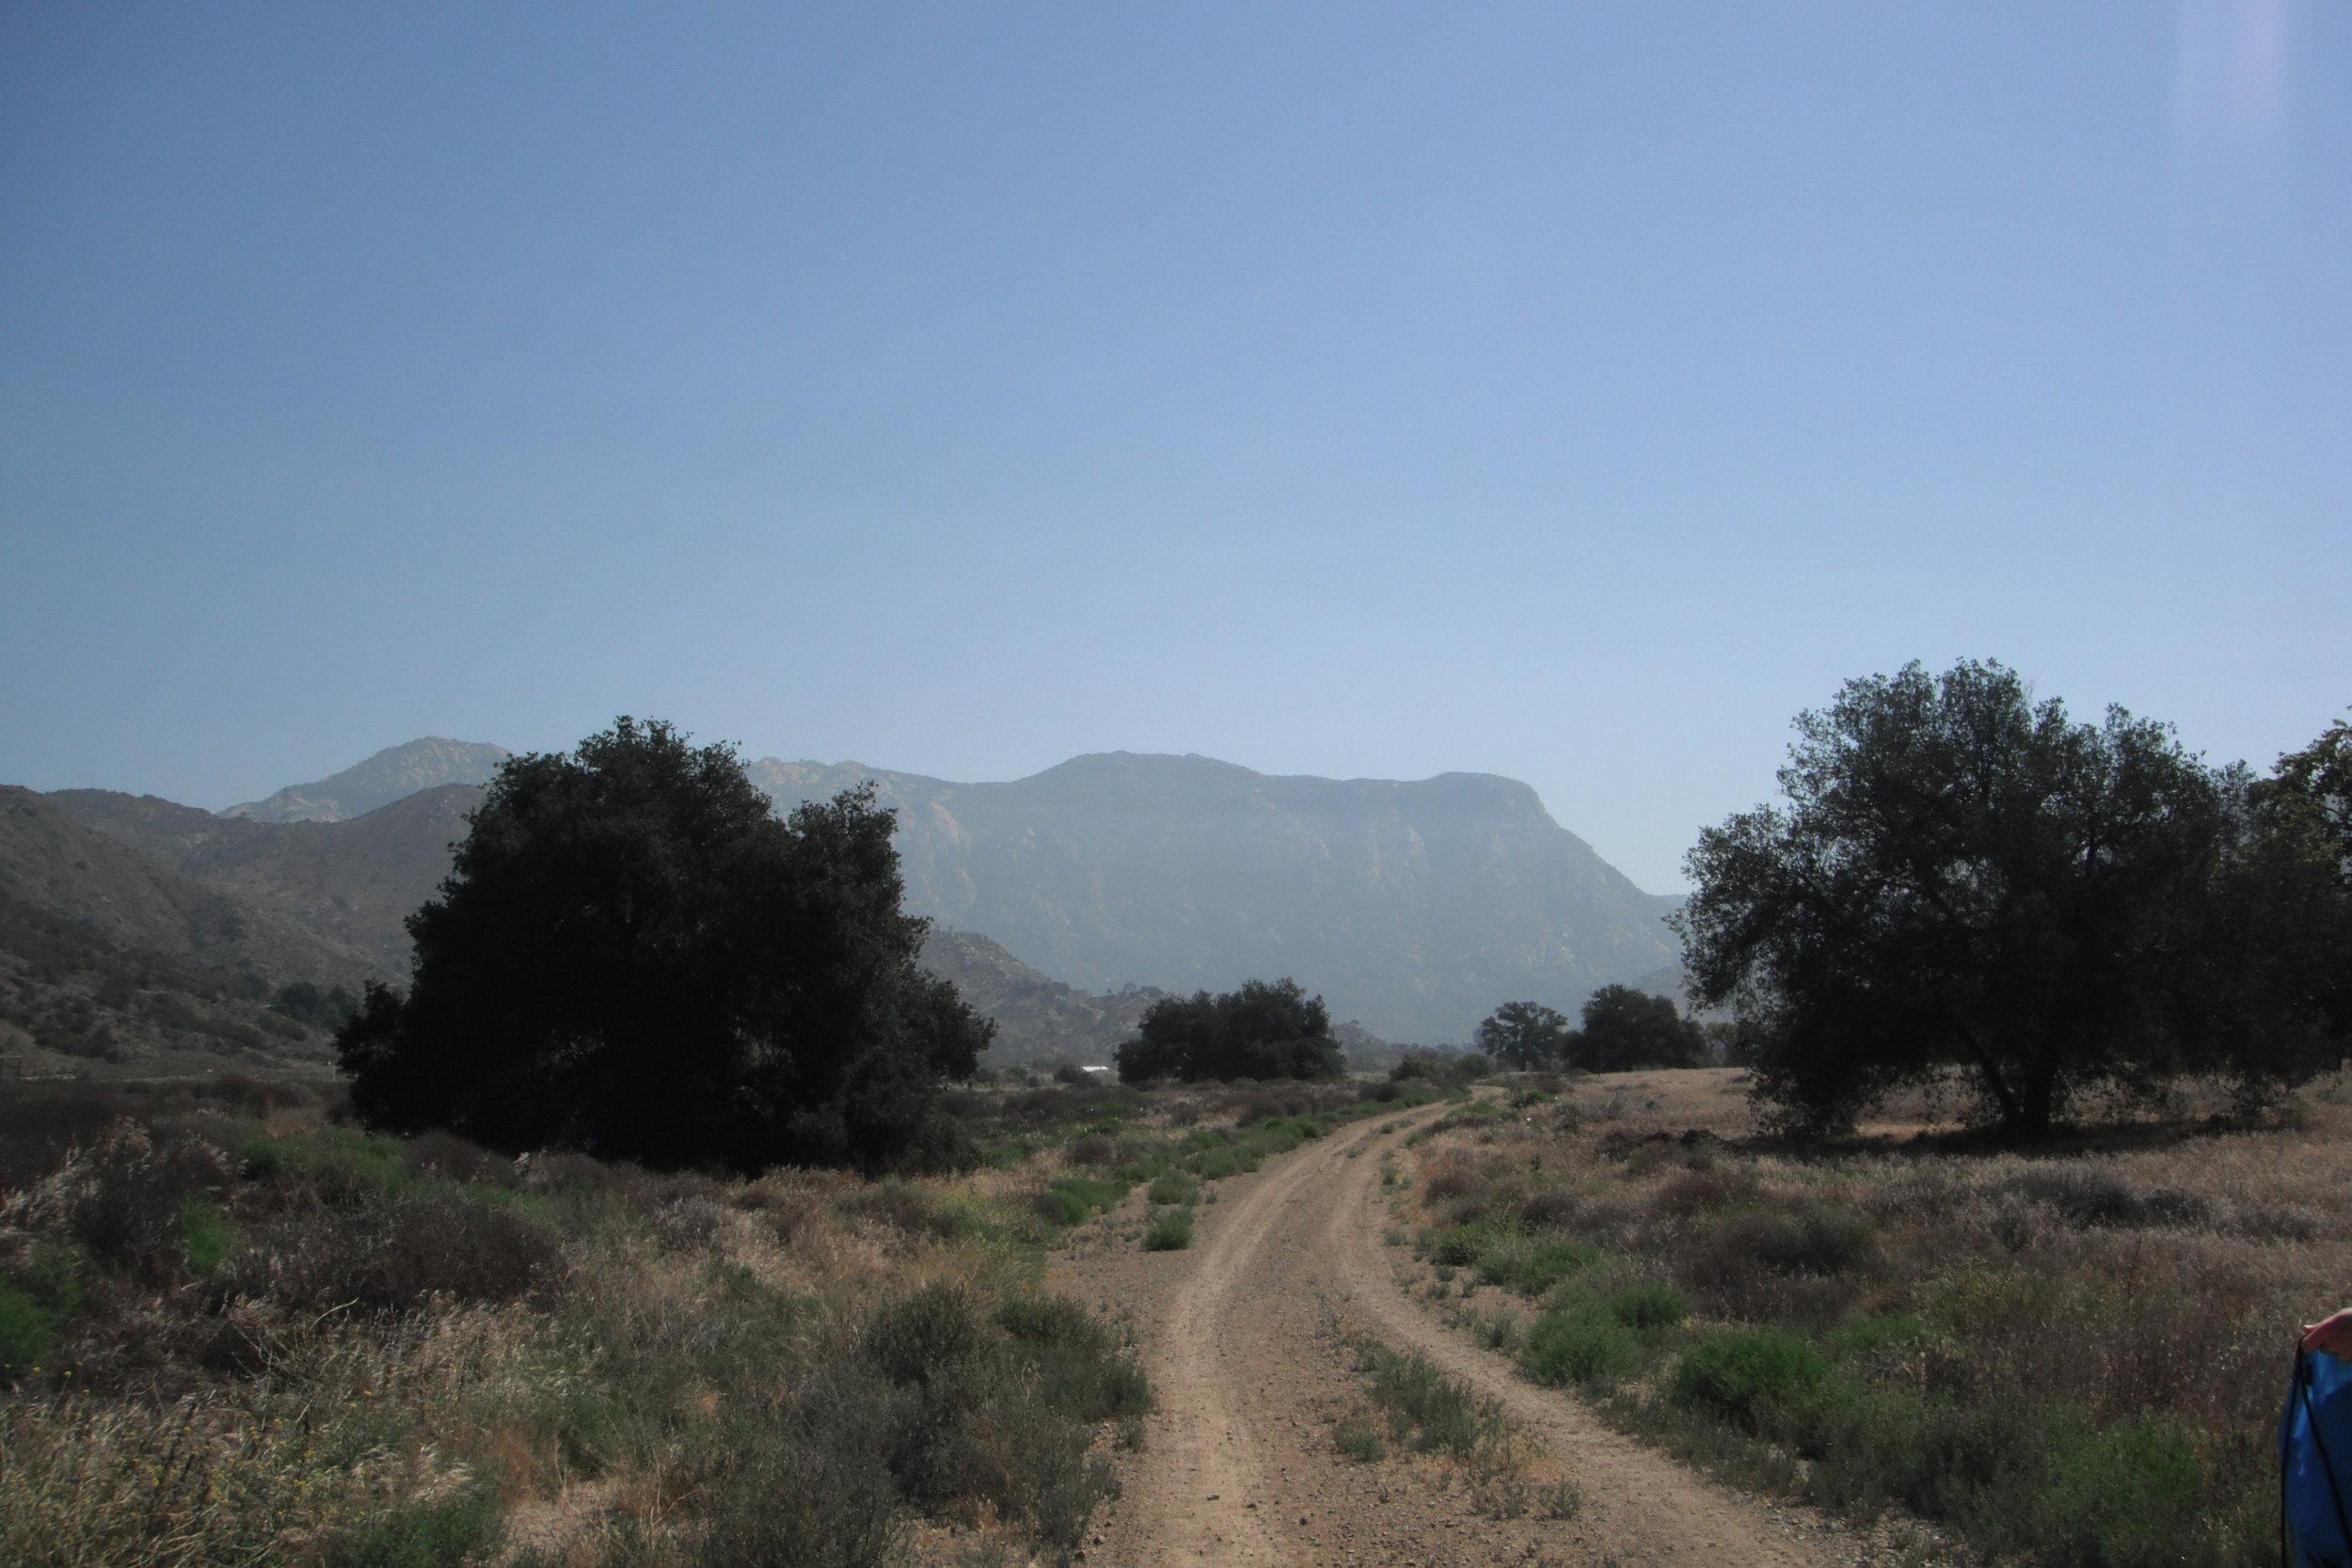 Photo by Alyssa Burley, EnviroMINE, Inc. for El Monte Nature Preserve, LLC.